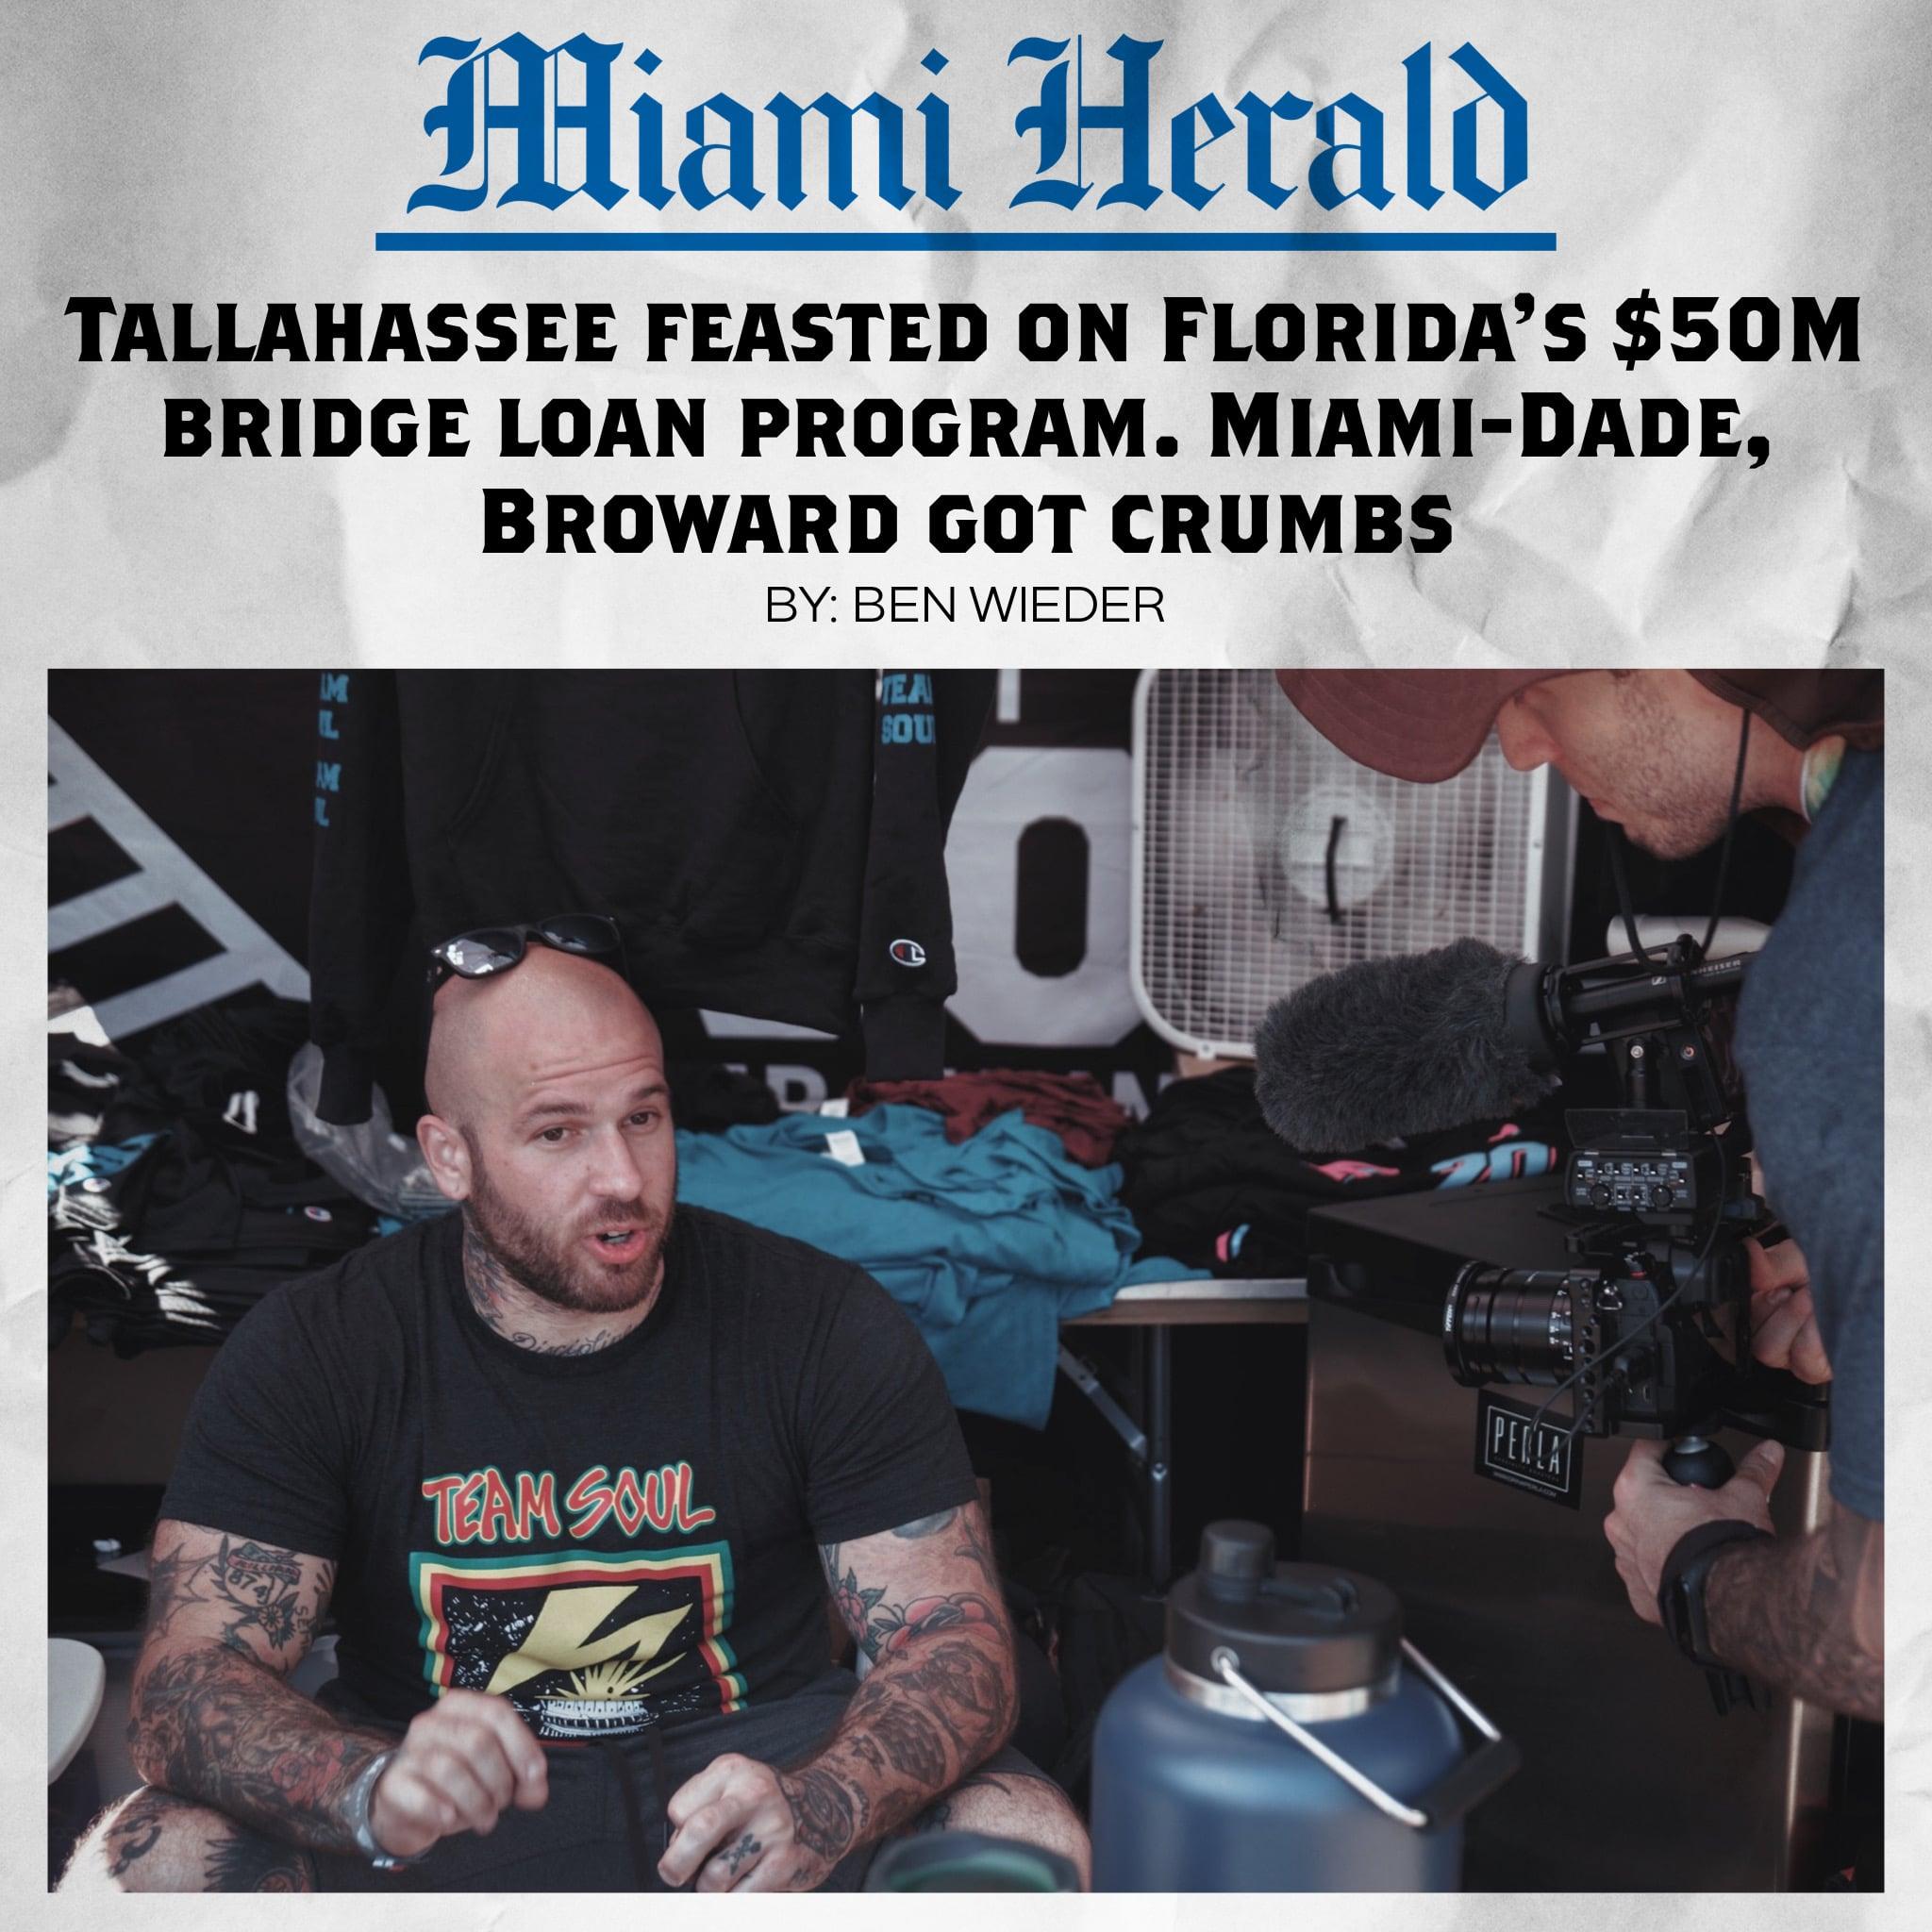 Miami Herald: Tallahassee feasted on Florida's $50M bridge loan program. Miami-Dade, Broward got crumbs